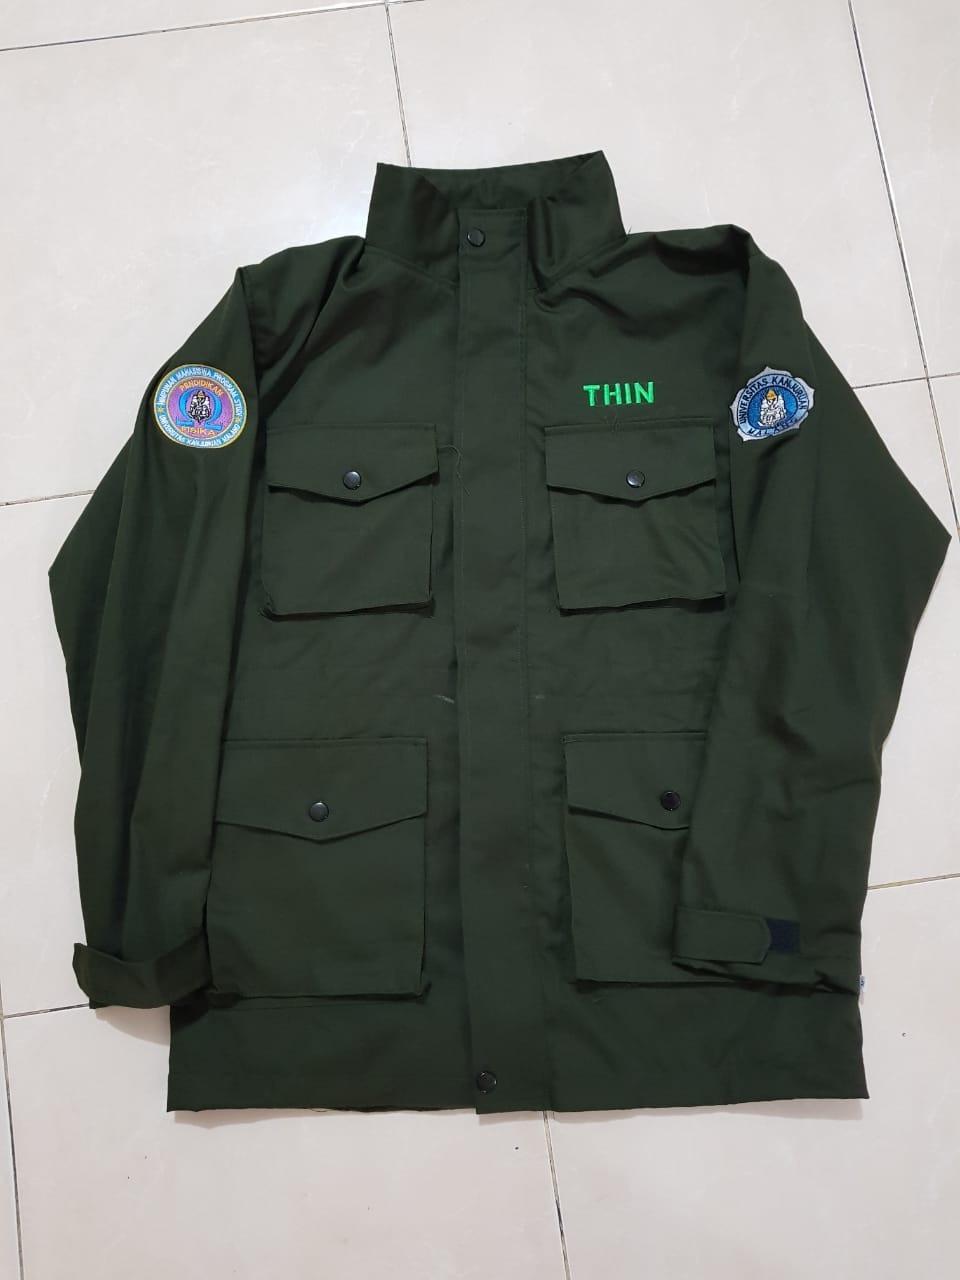 570+ Desain Jaket Himpunan Terbaru